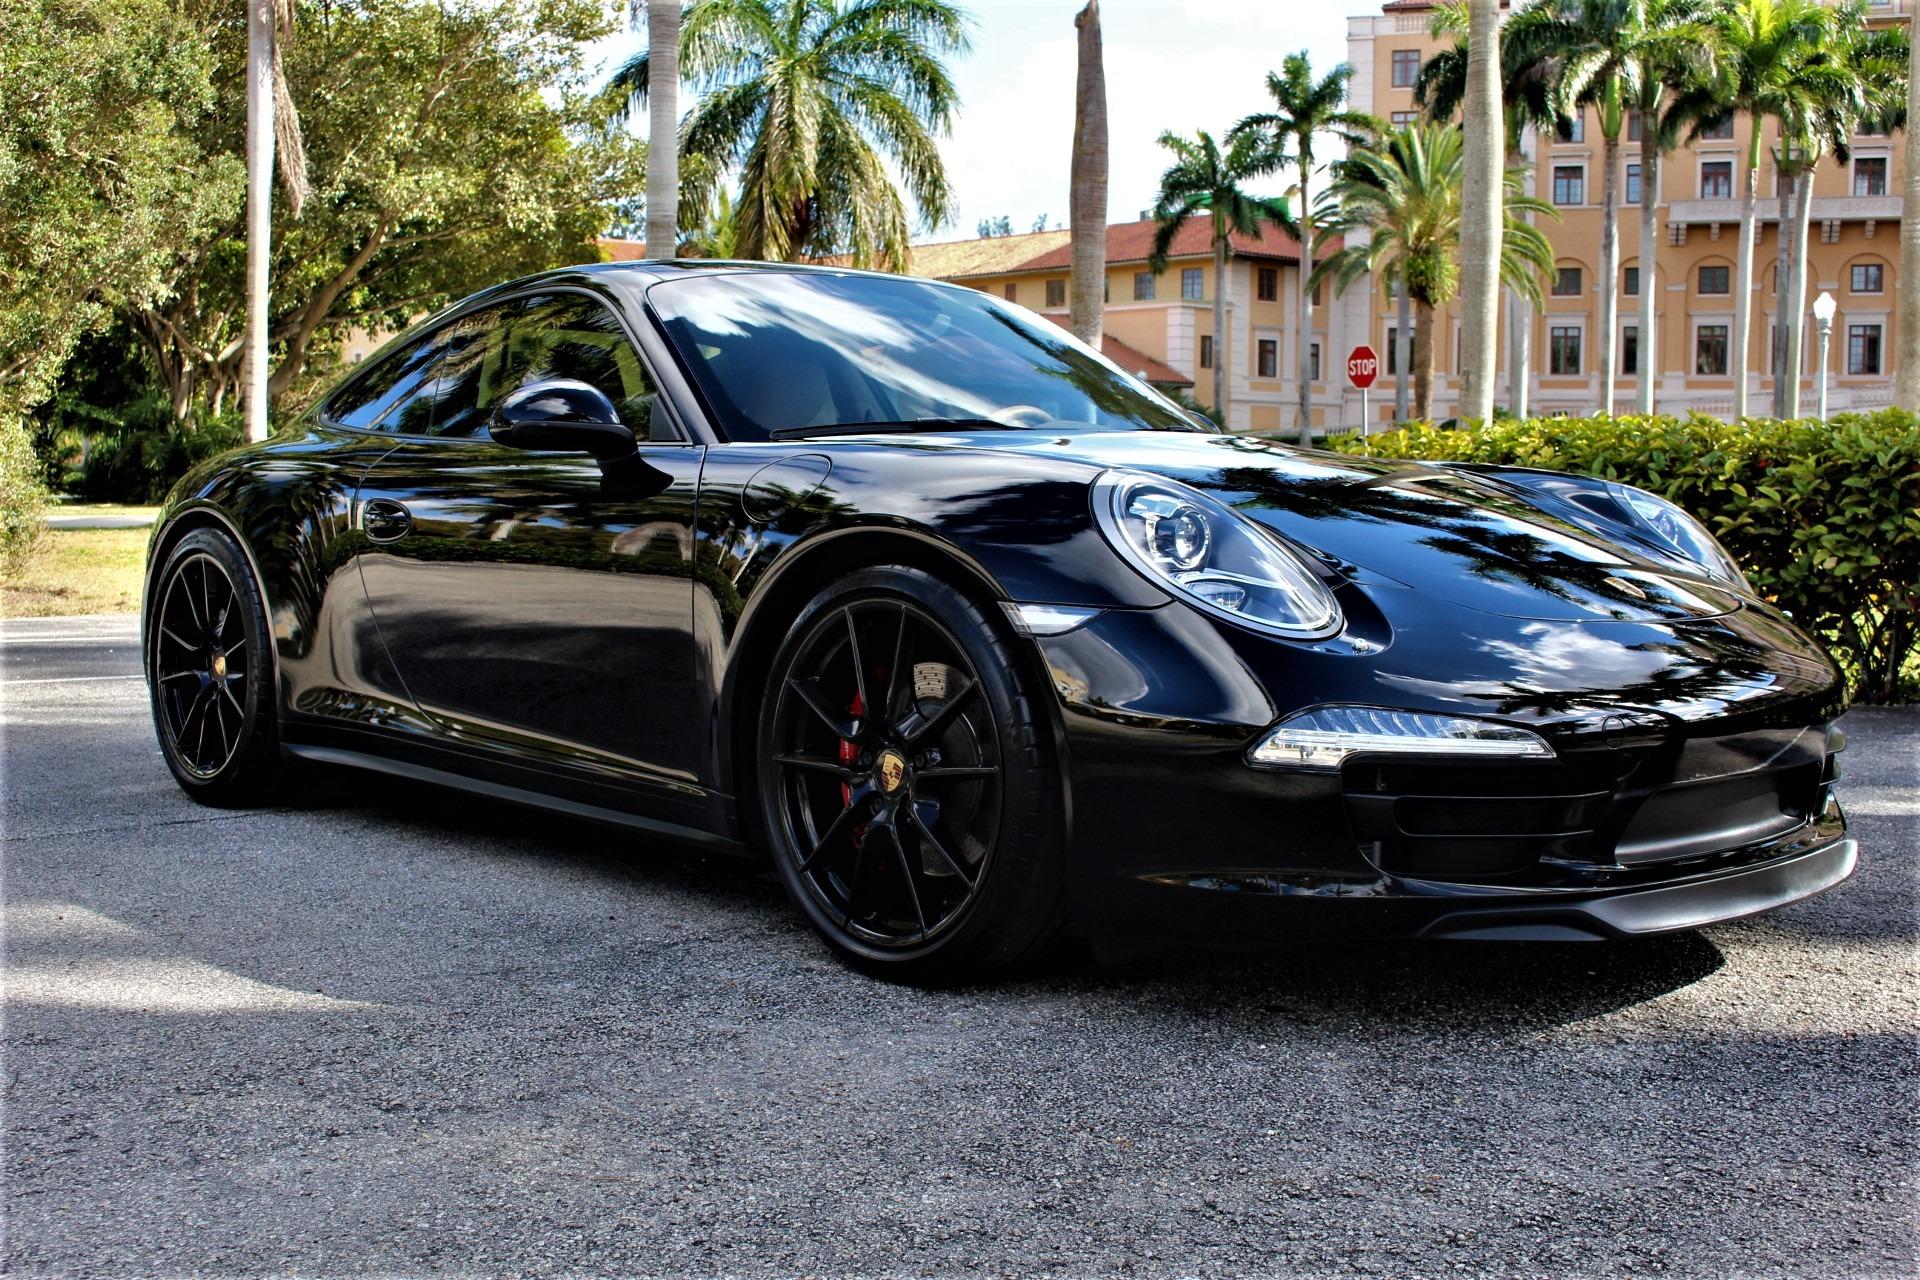 Used 2013 Porsche 911 Carrera 4S for sale $79,850 at The Gables Sports Cars in Miami FL 33146 2